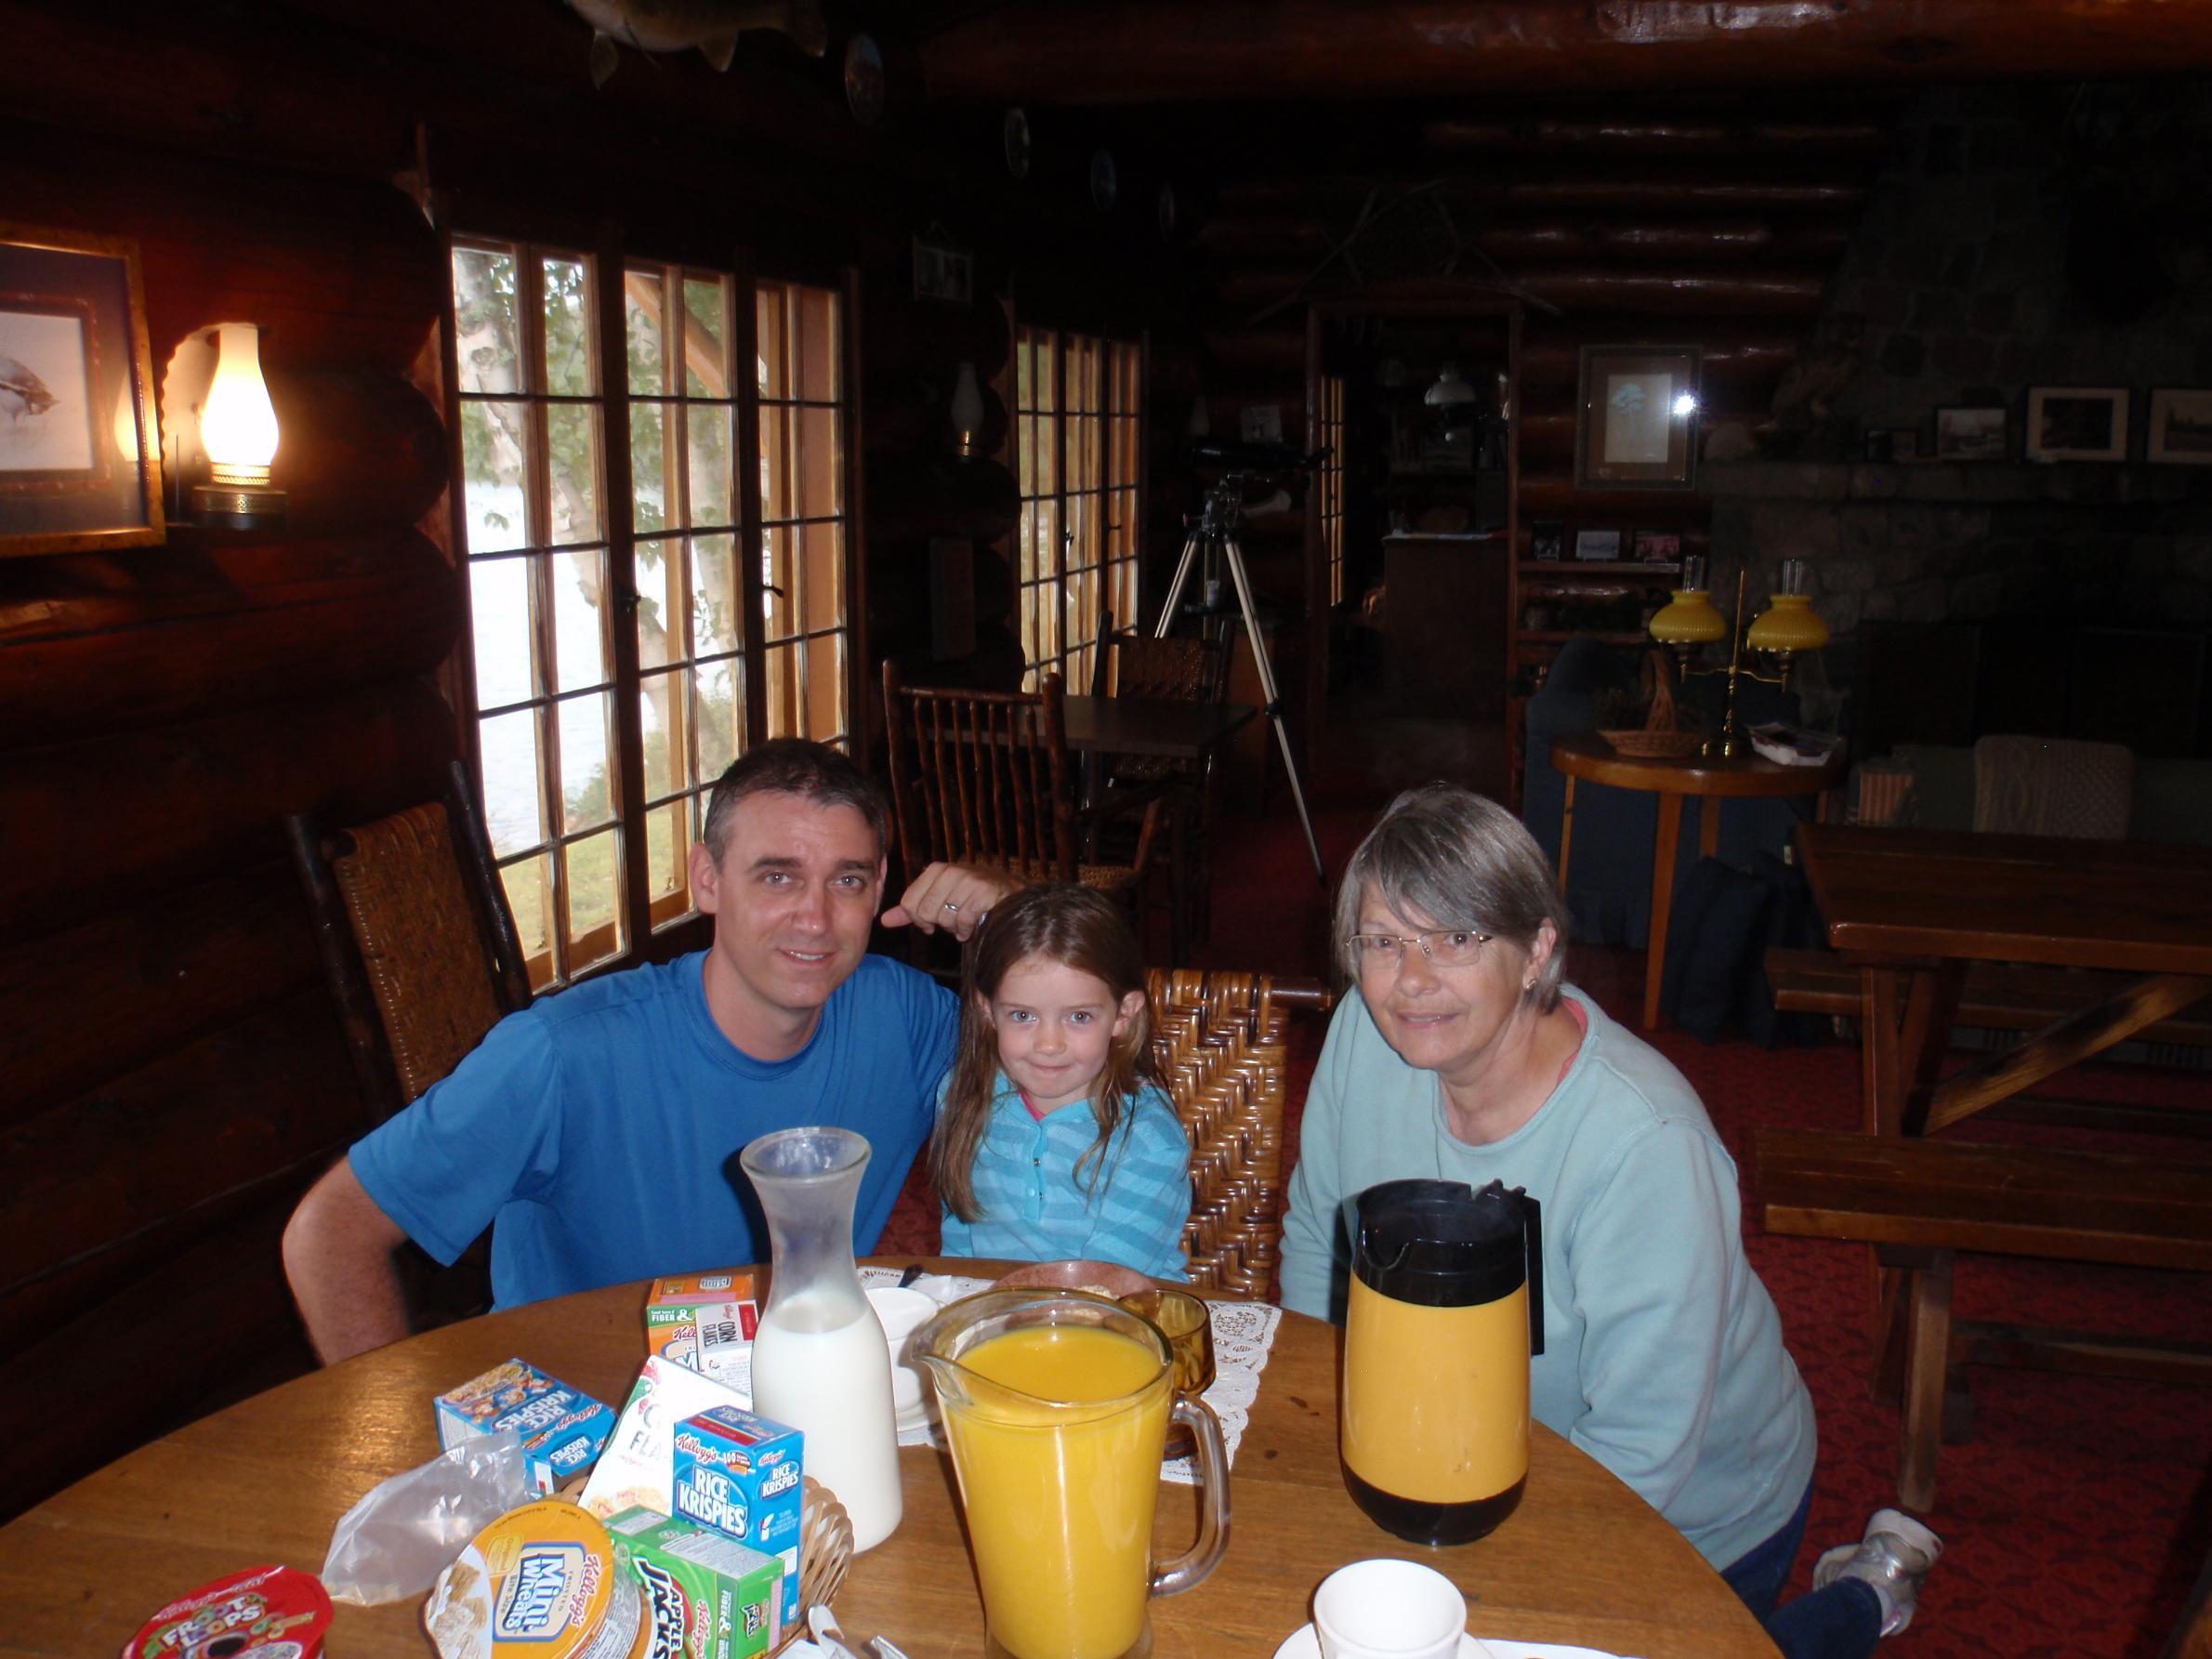 Lynn having some breakfast with us